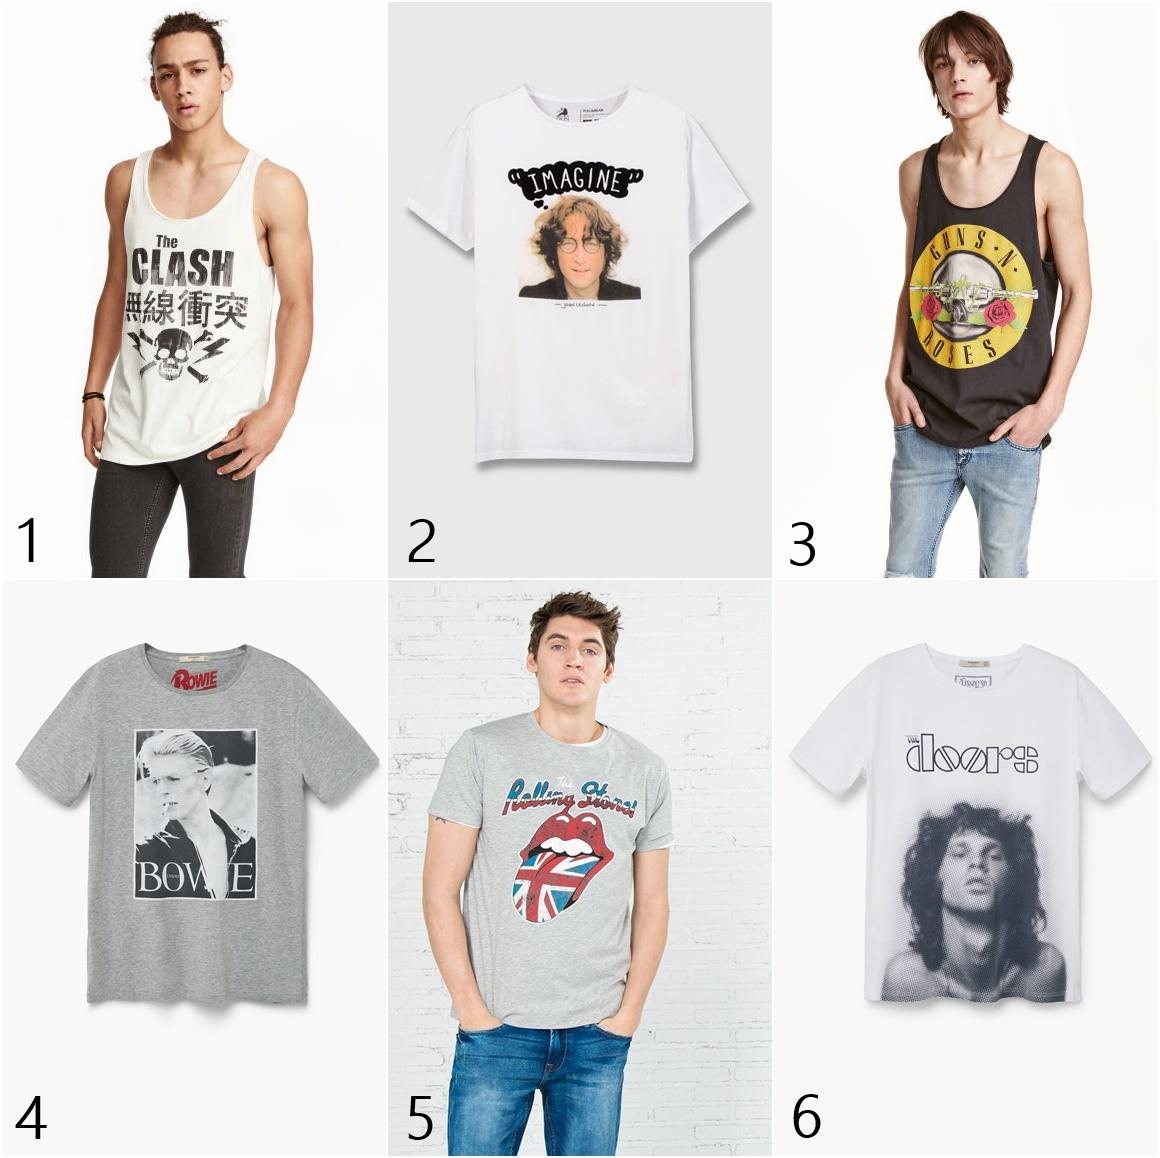 man-camisetas-chico-grupos-01